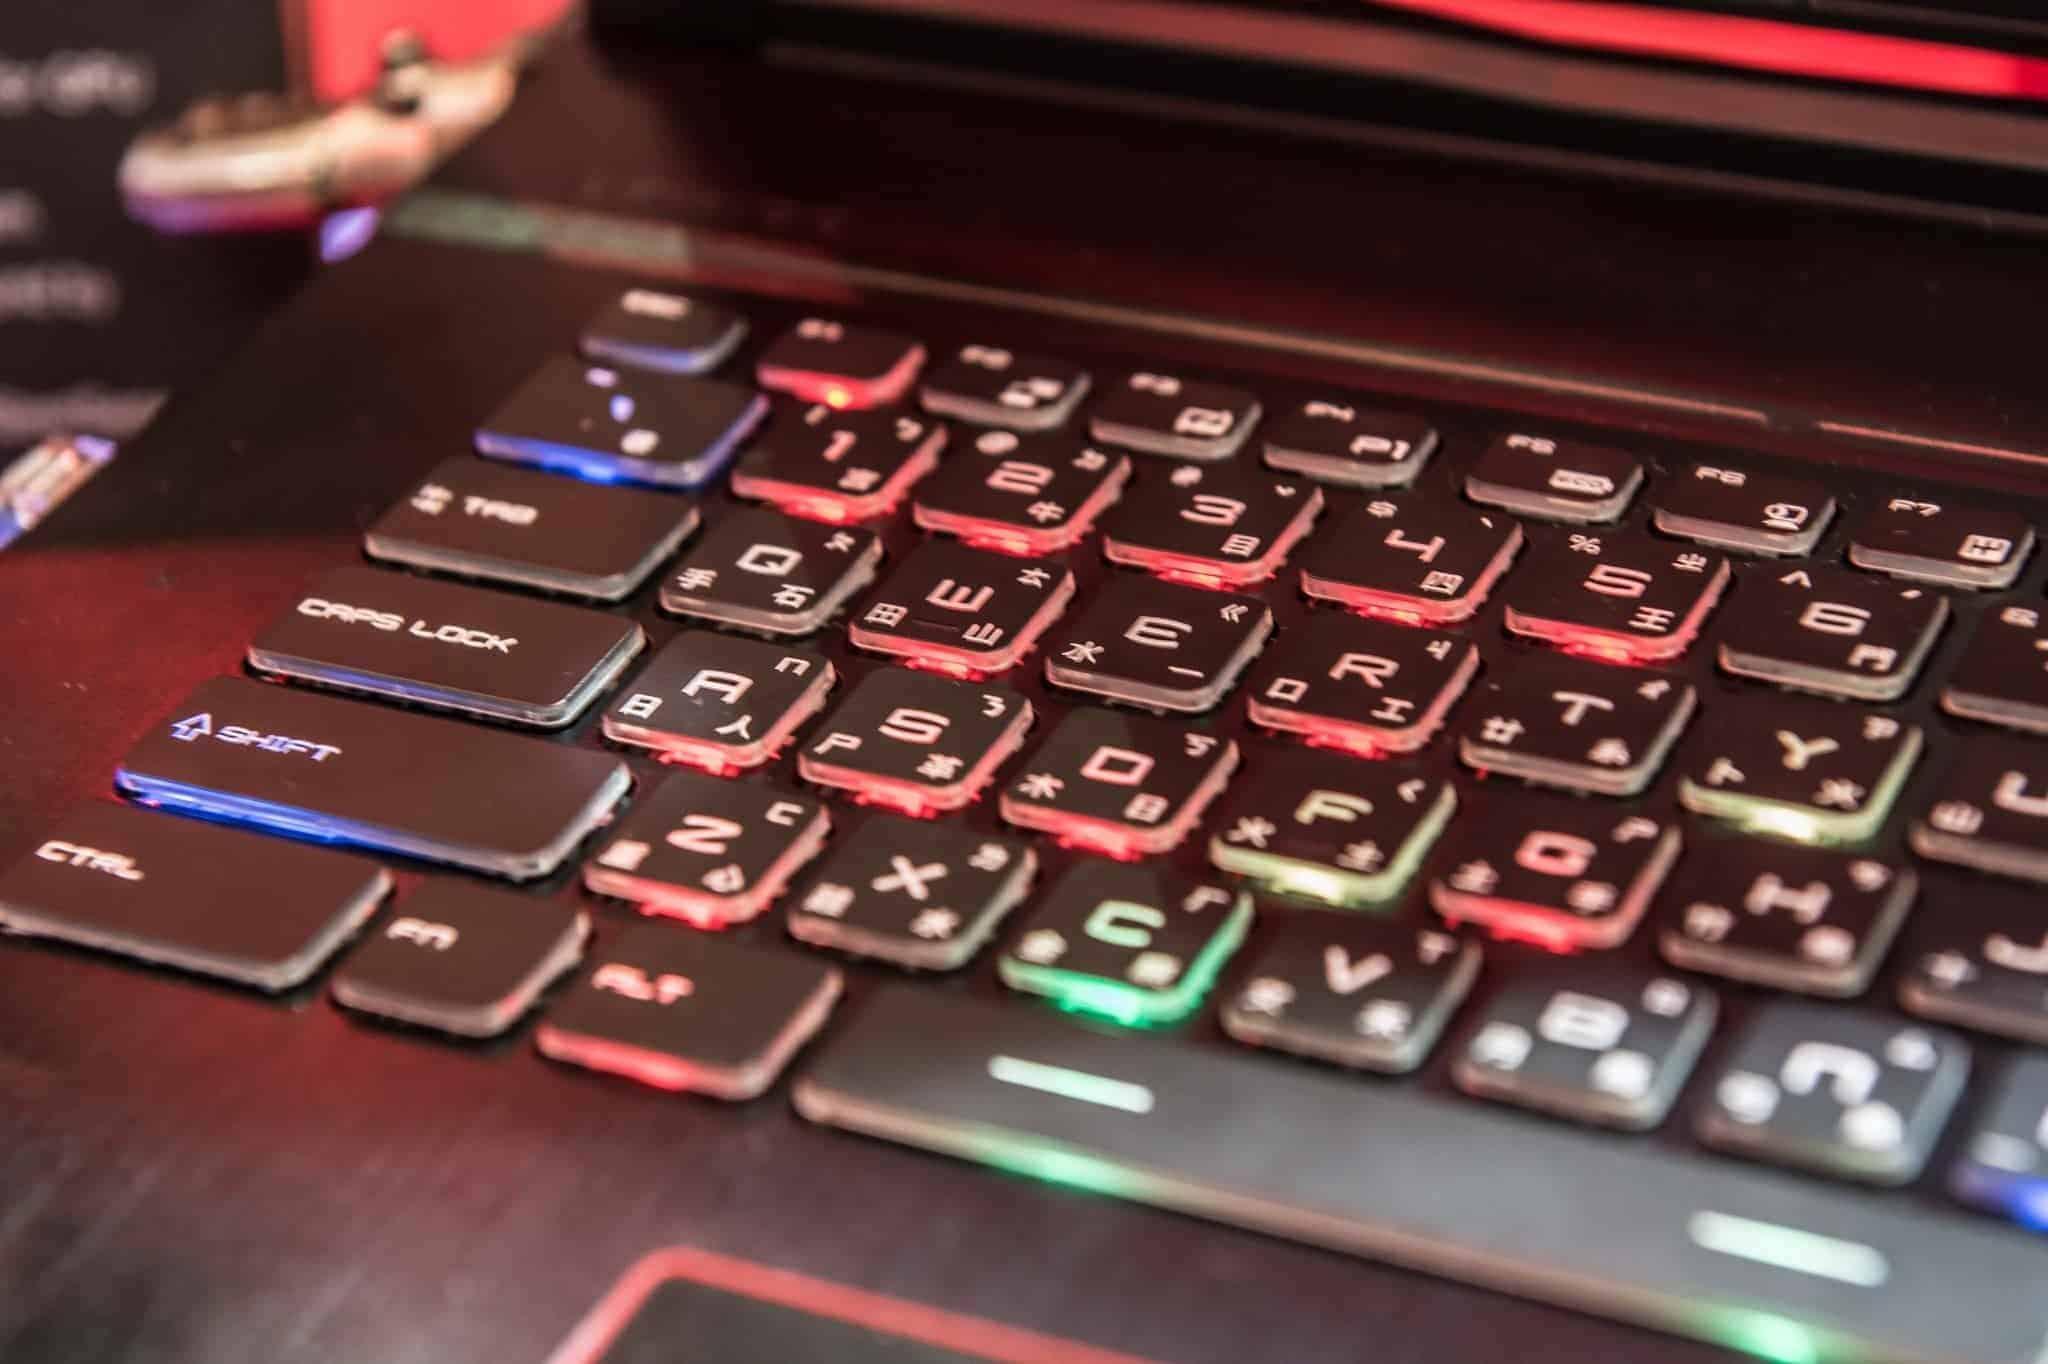 Computex 電腦展重點整理 - 電競與電腦廠商的較勁(一)-TechTeller (科技說)